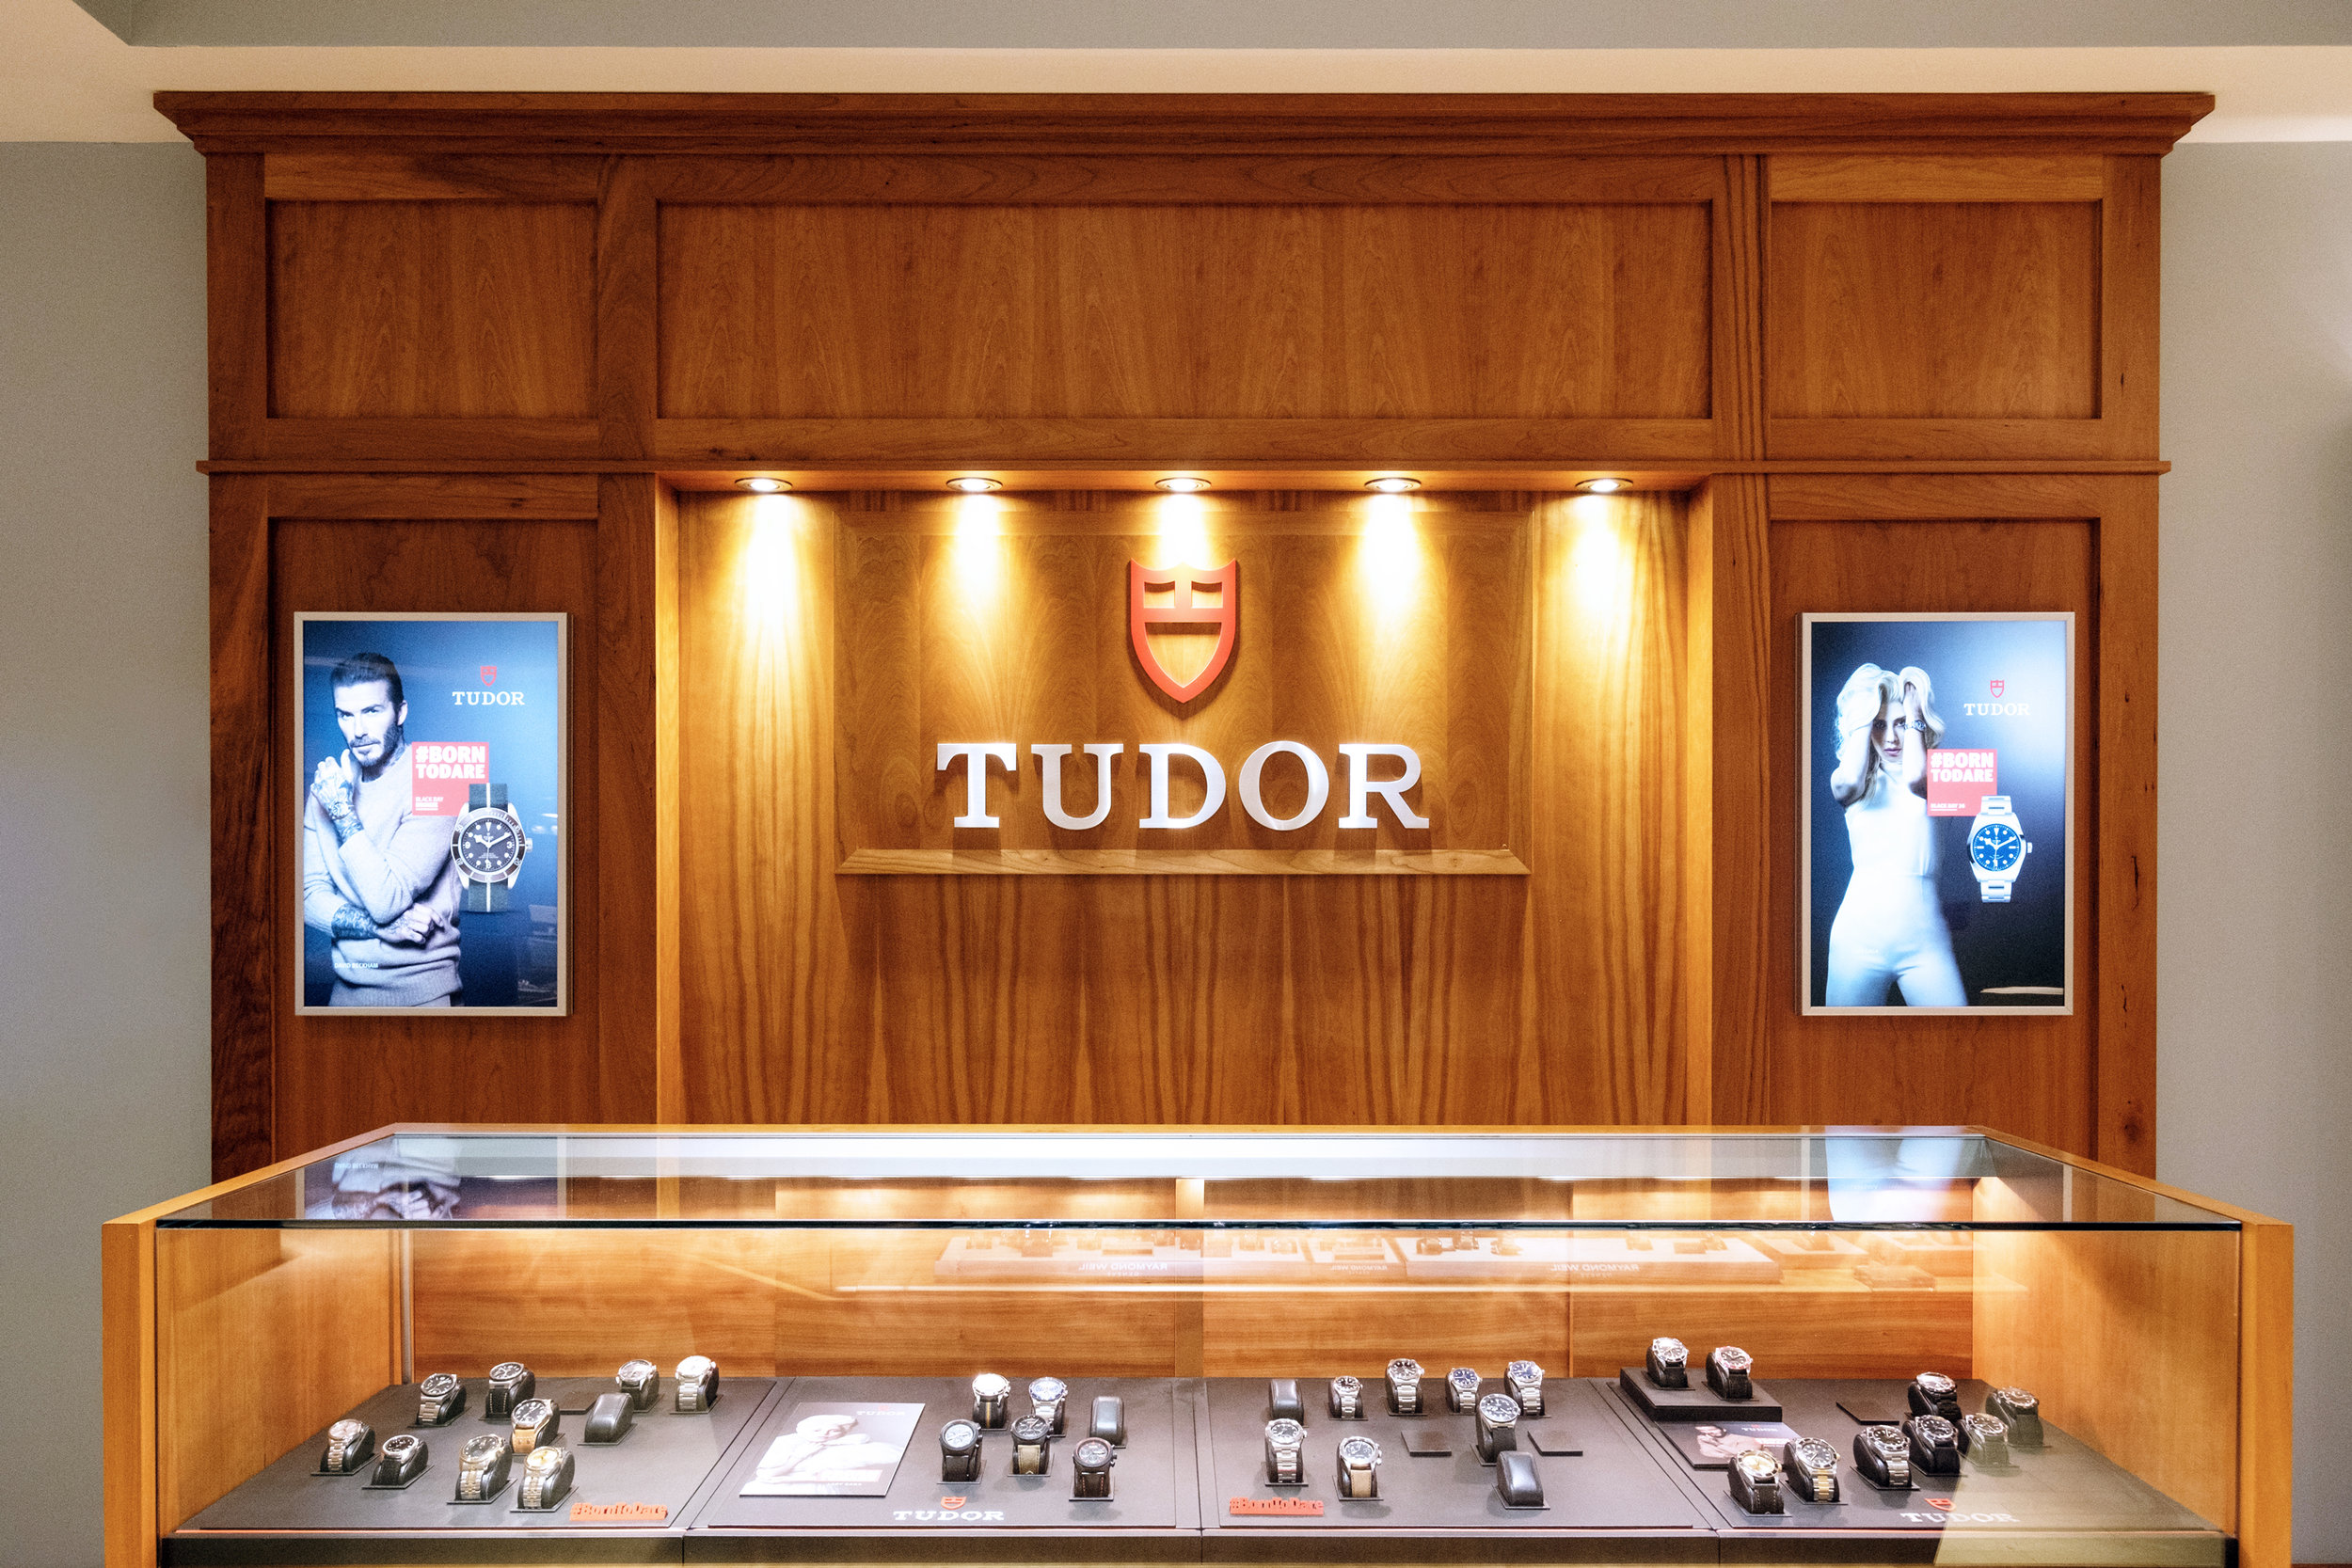 Tudor-Counter2.jpg